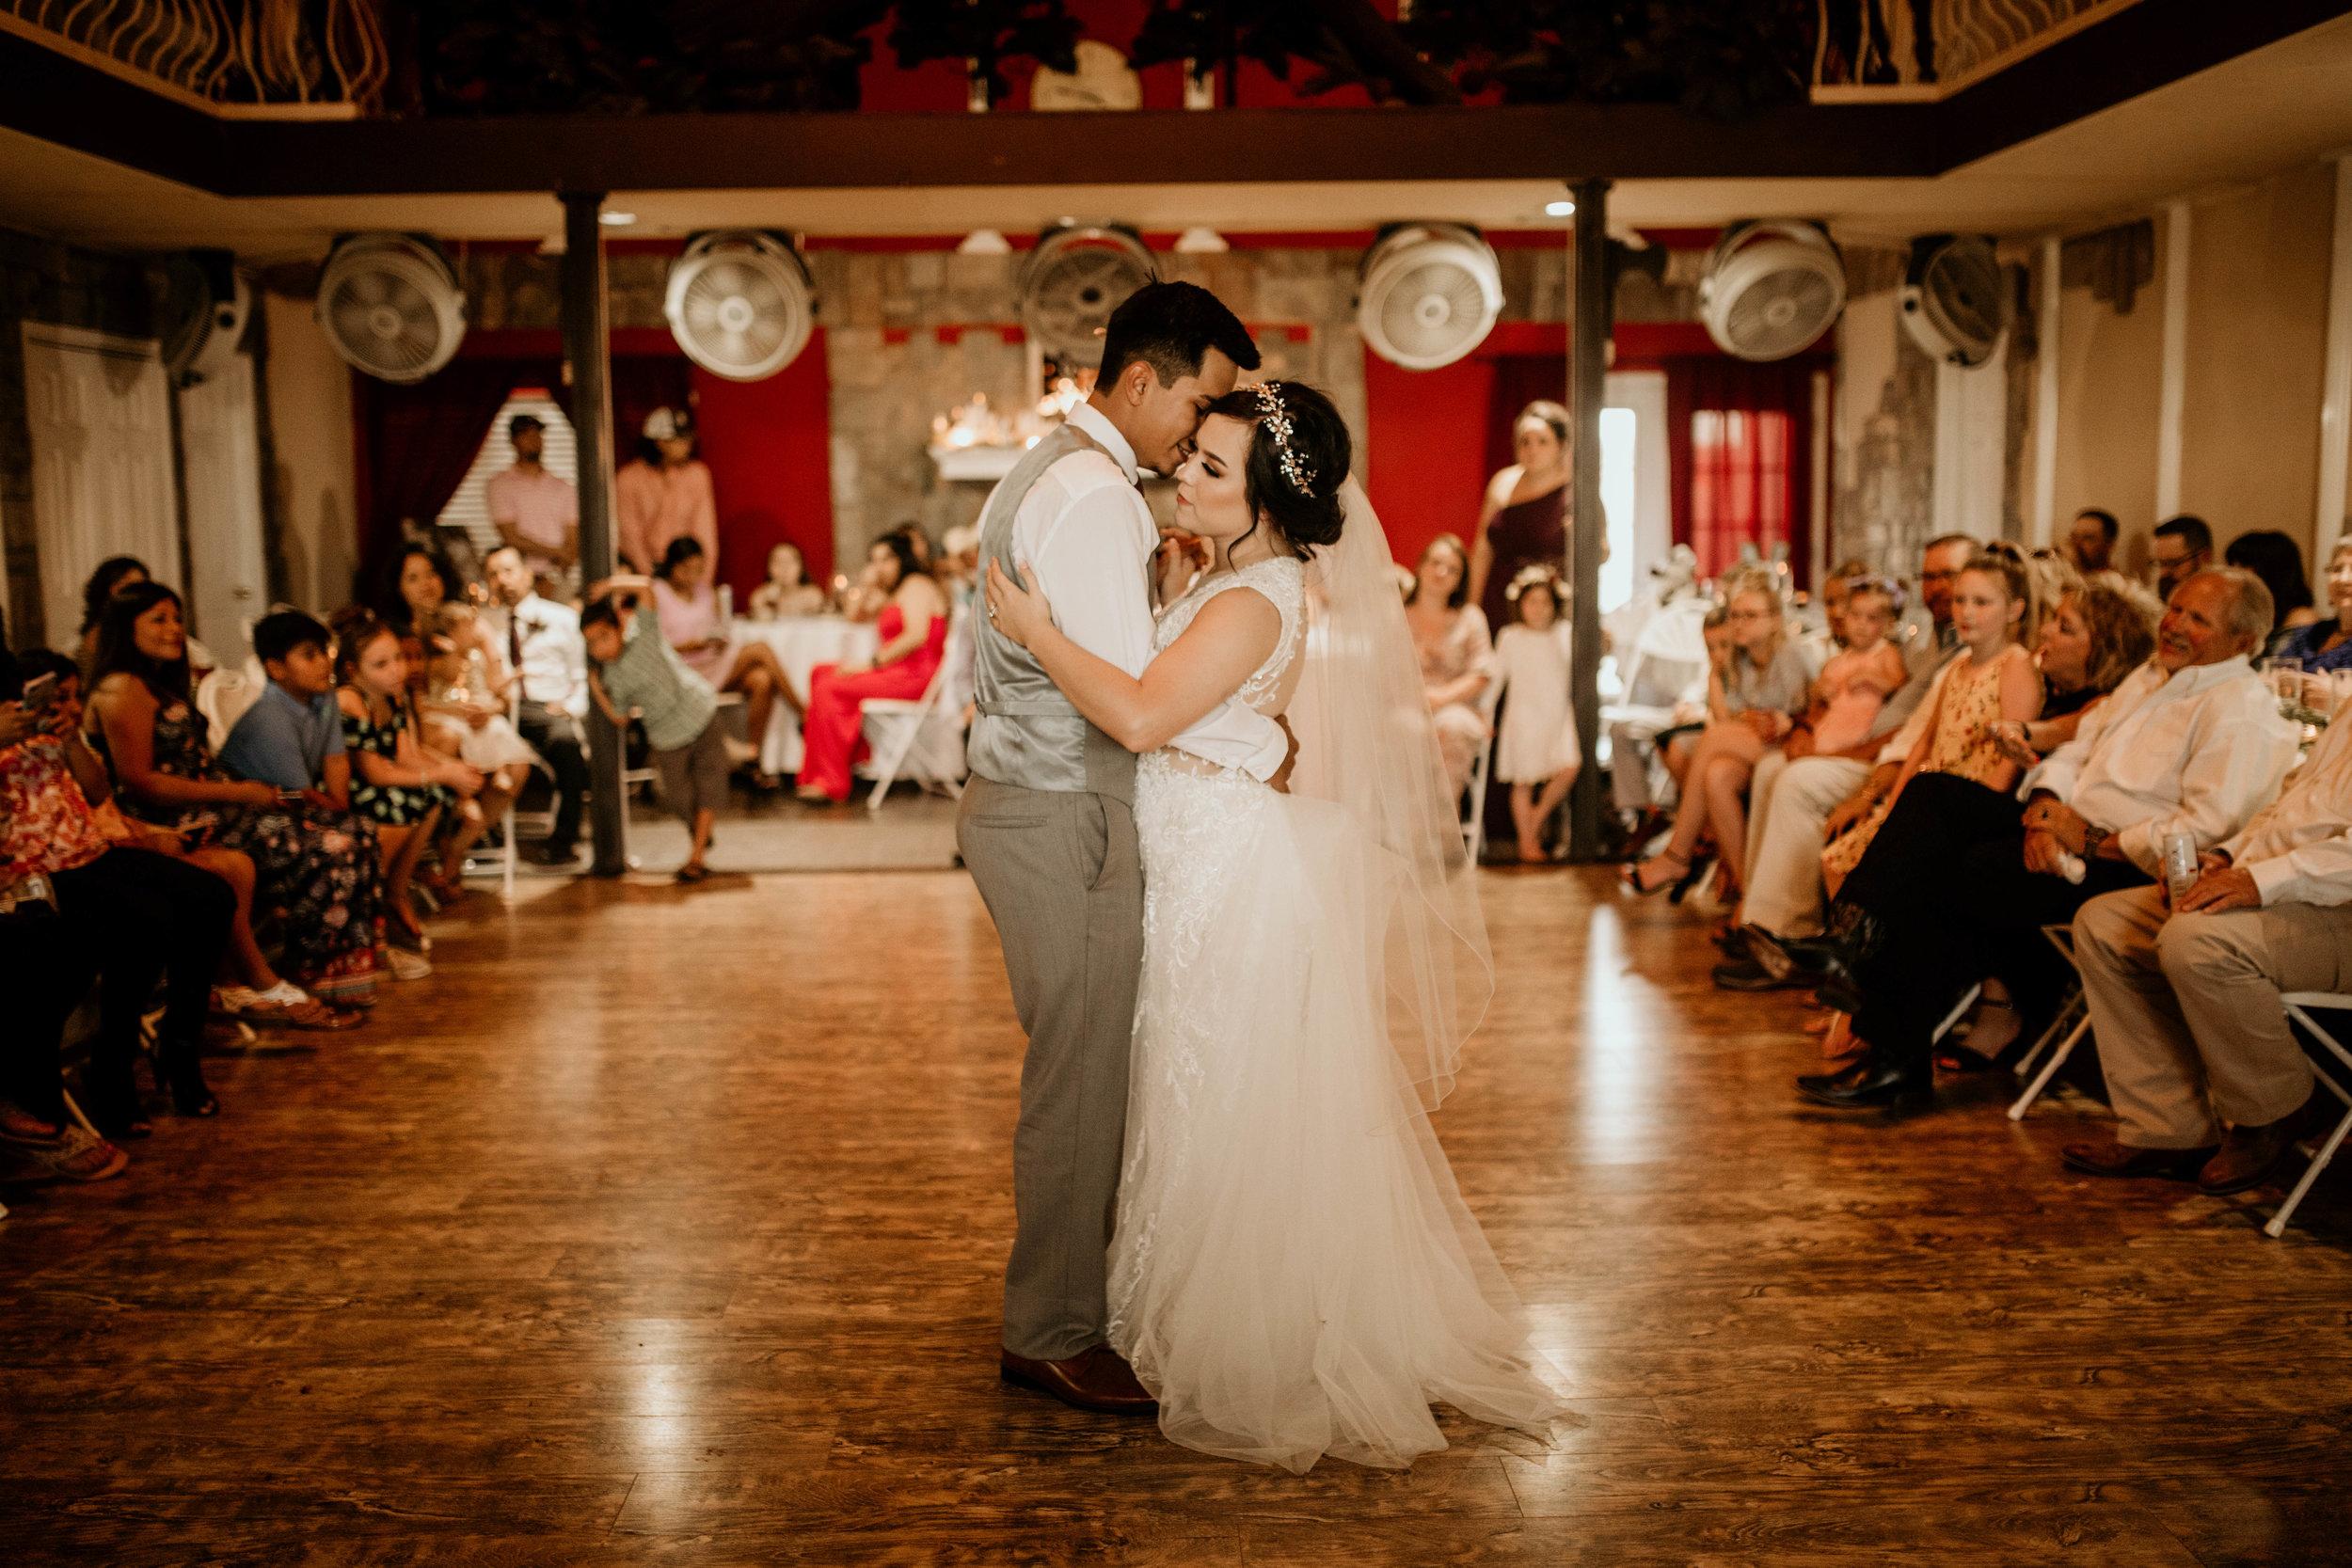 Lubbock,Texas WeddingDM7A1351.jpg